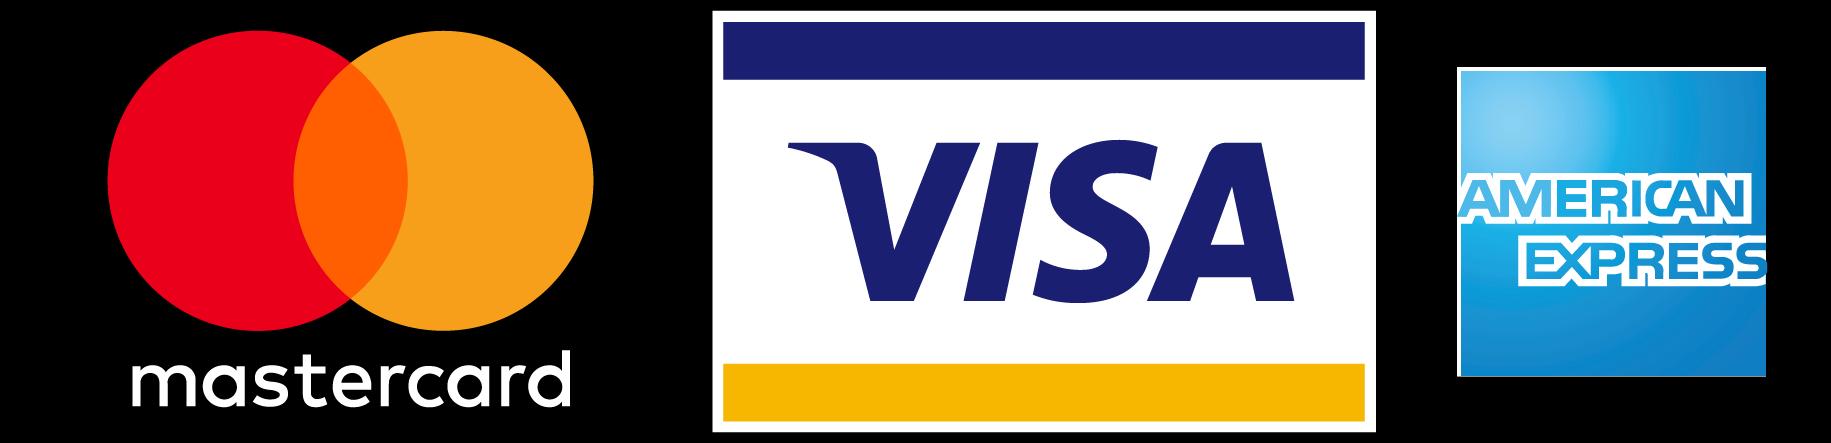 American Express Visa MasterCard Logo.